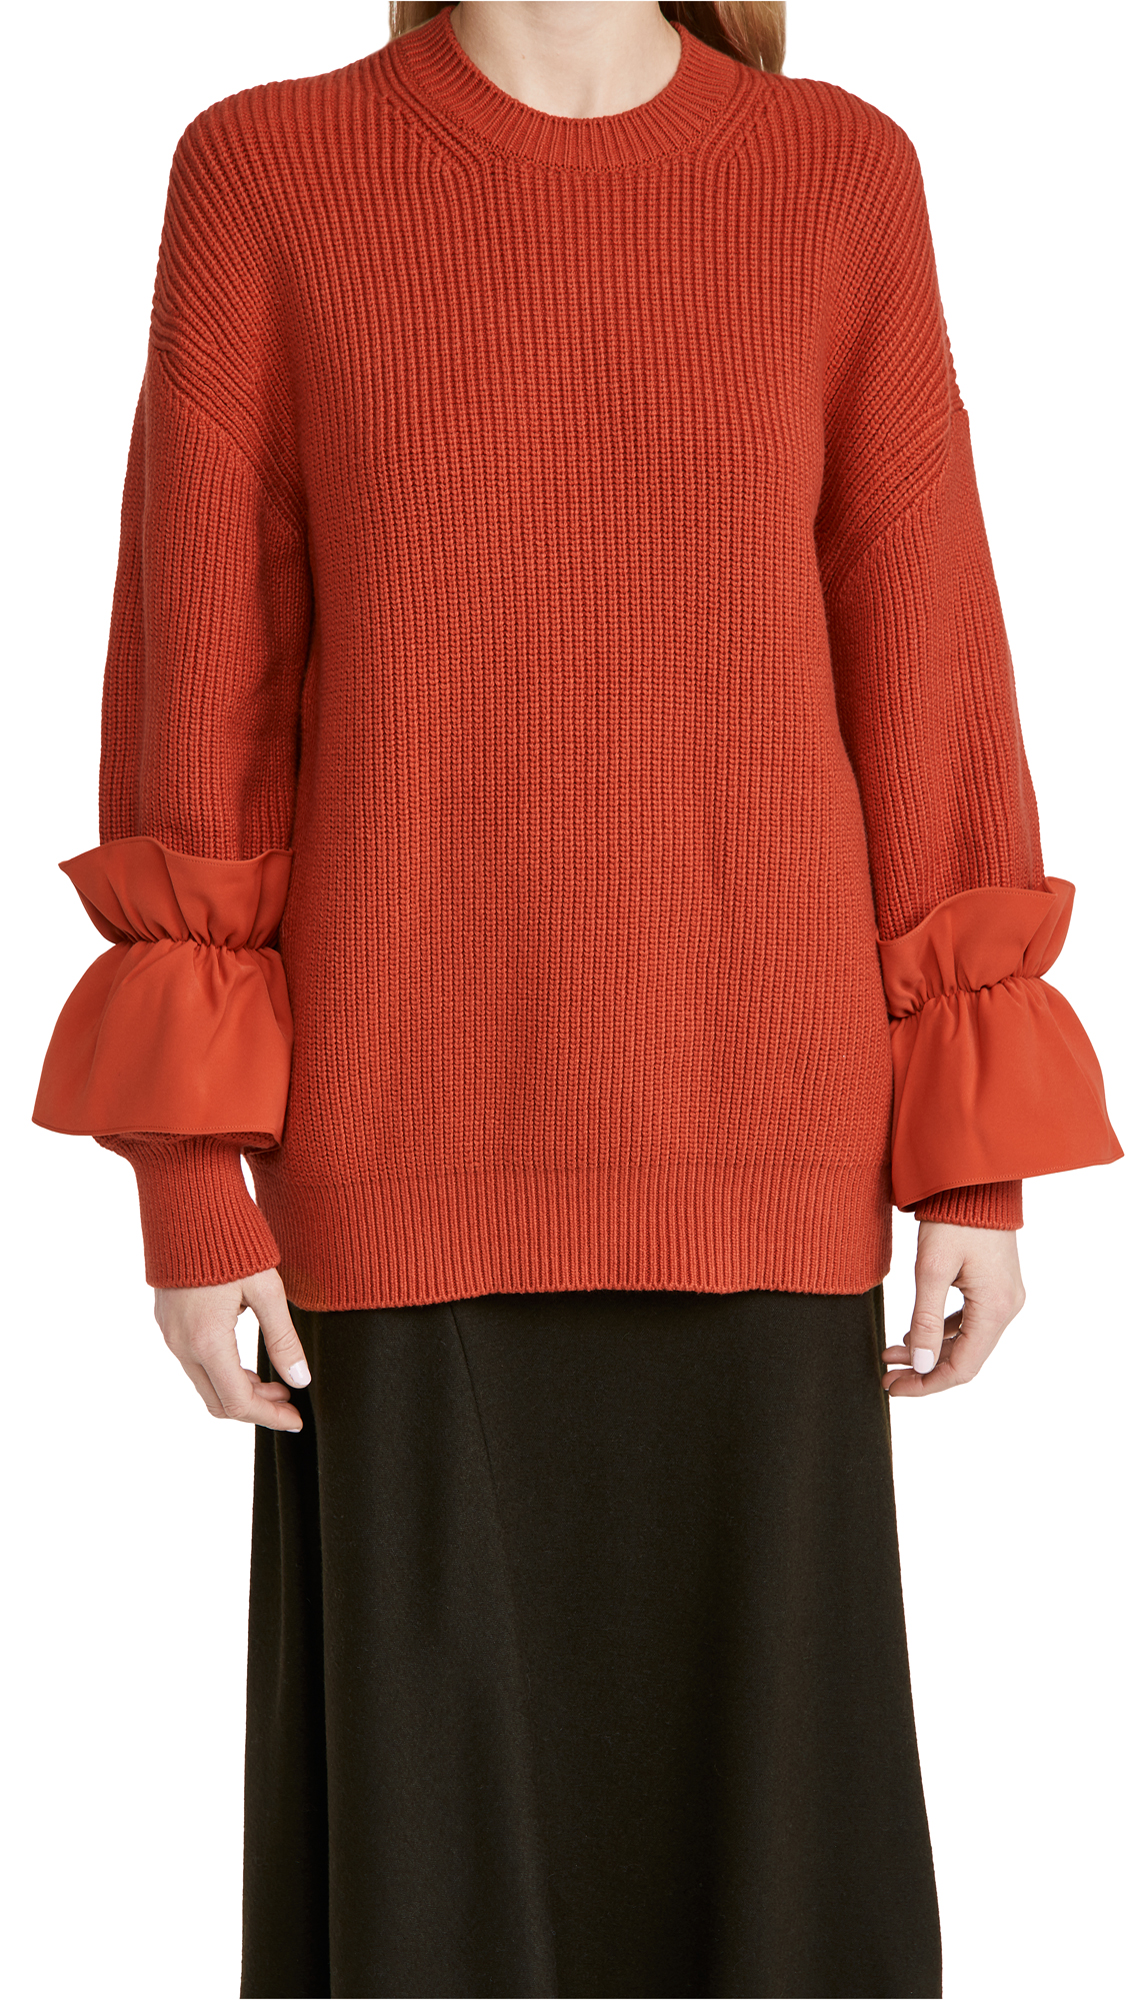 Adeam Ruffle Cuff Sweater